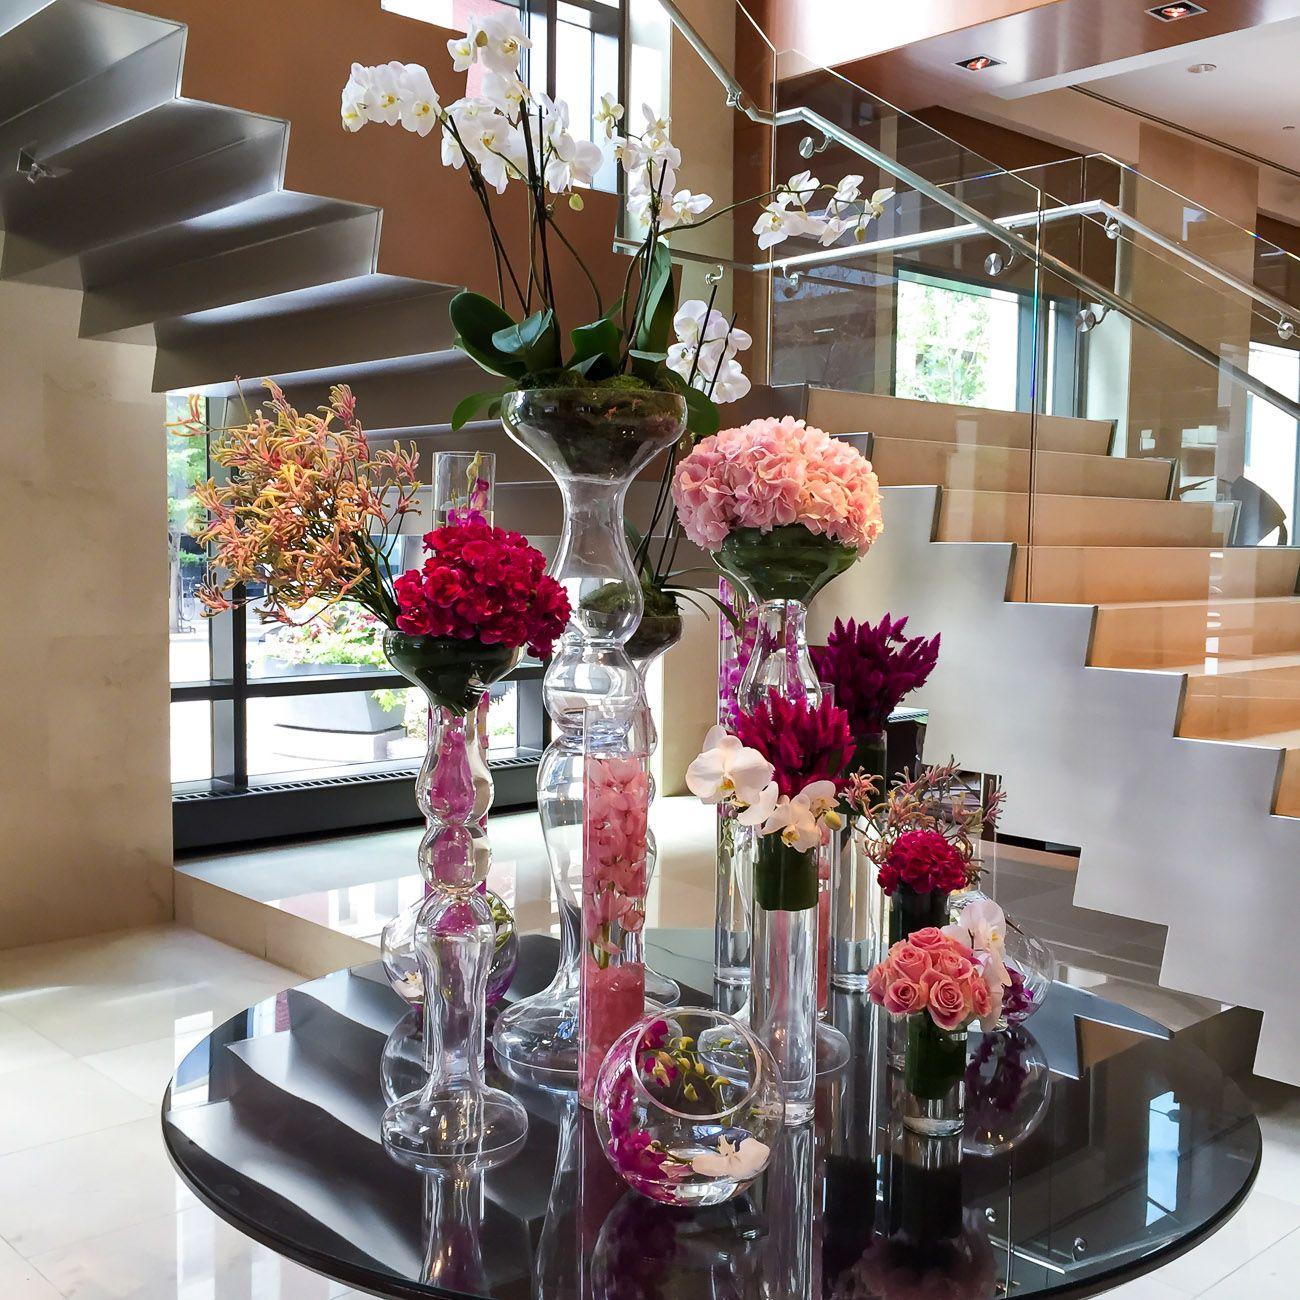 MileHigh Family Luxury at Four Seasons Hotel Denver